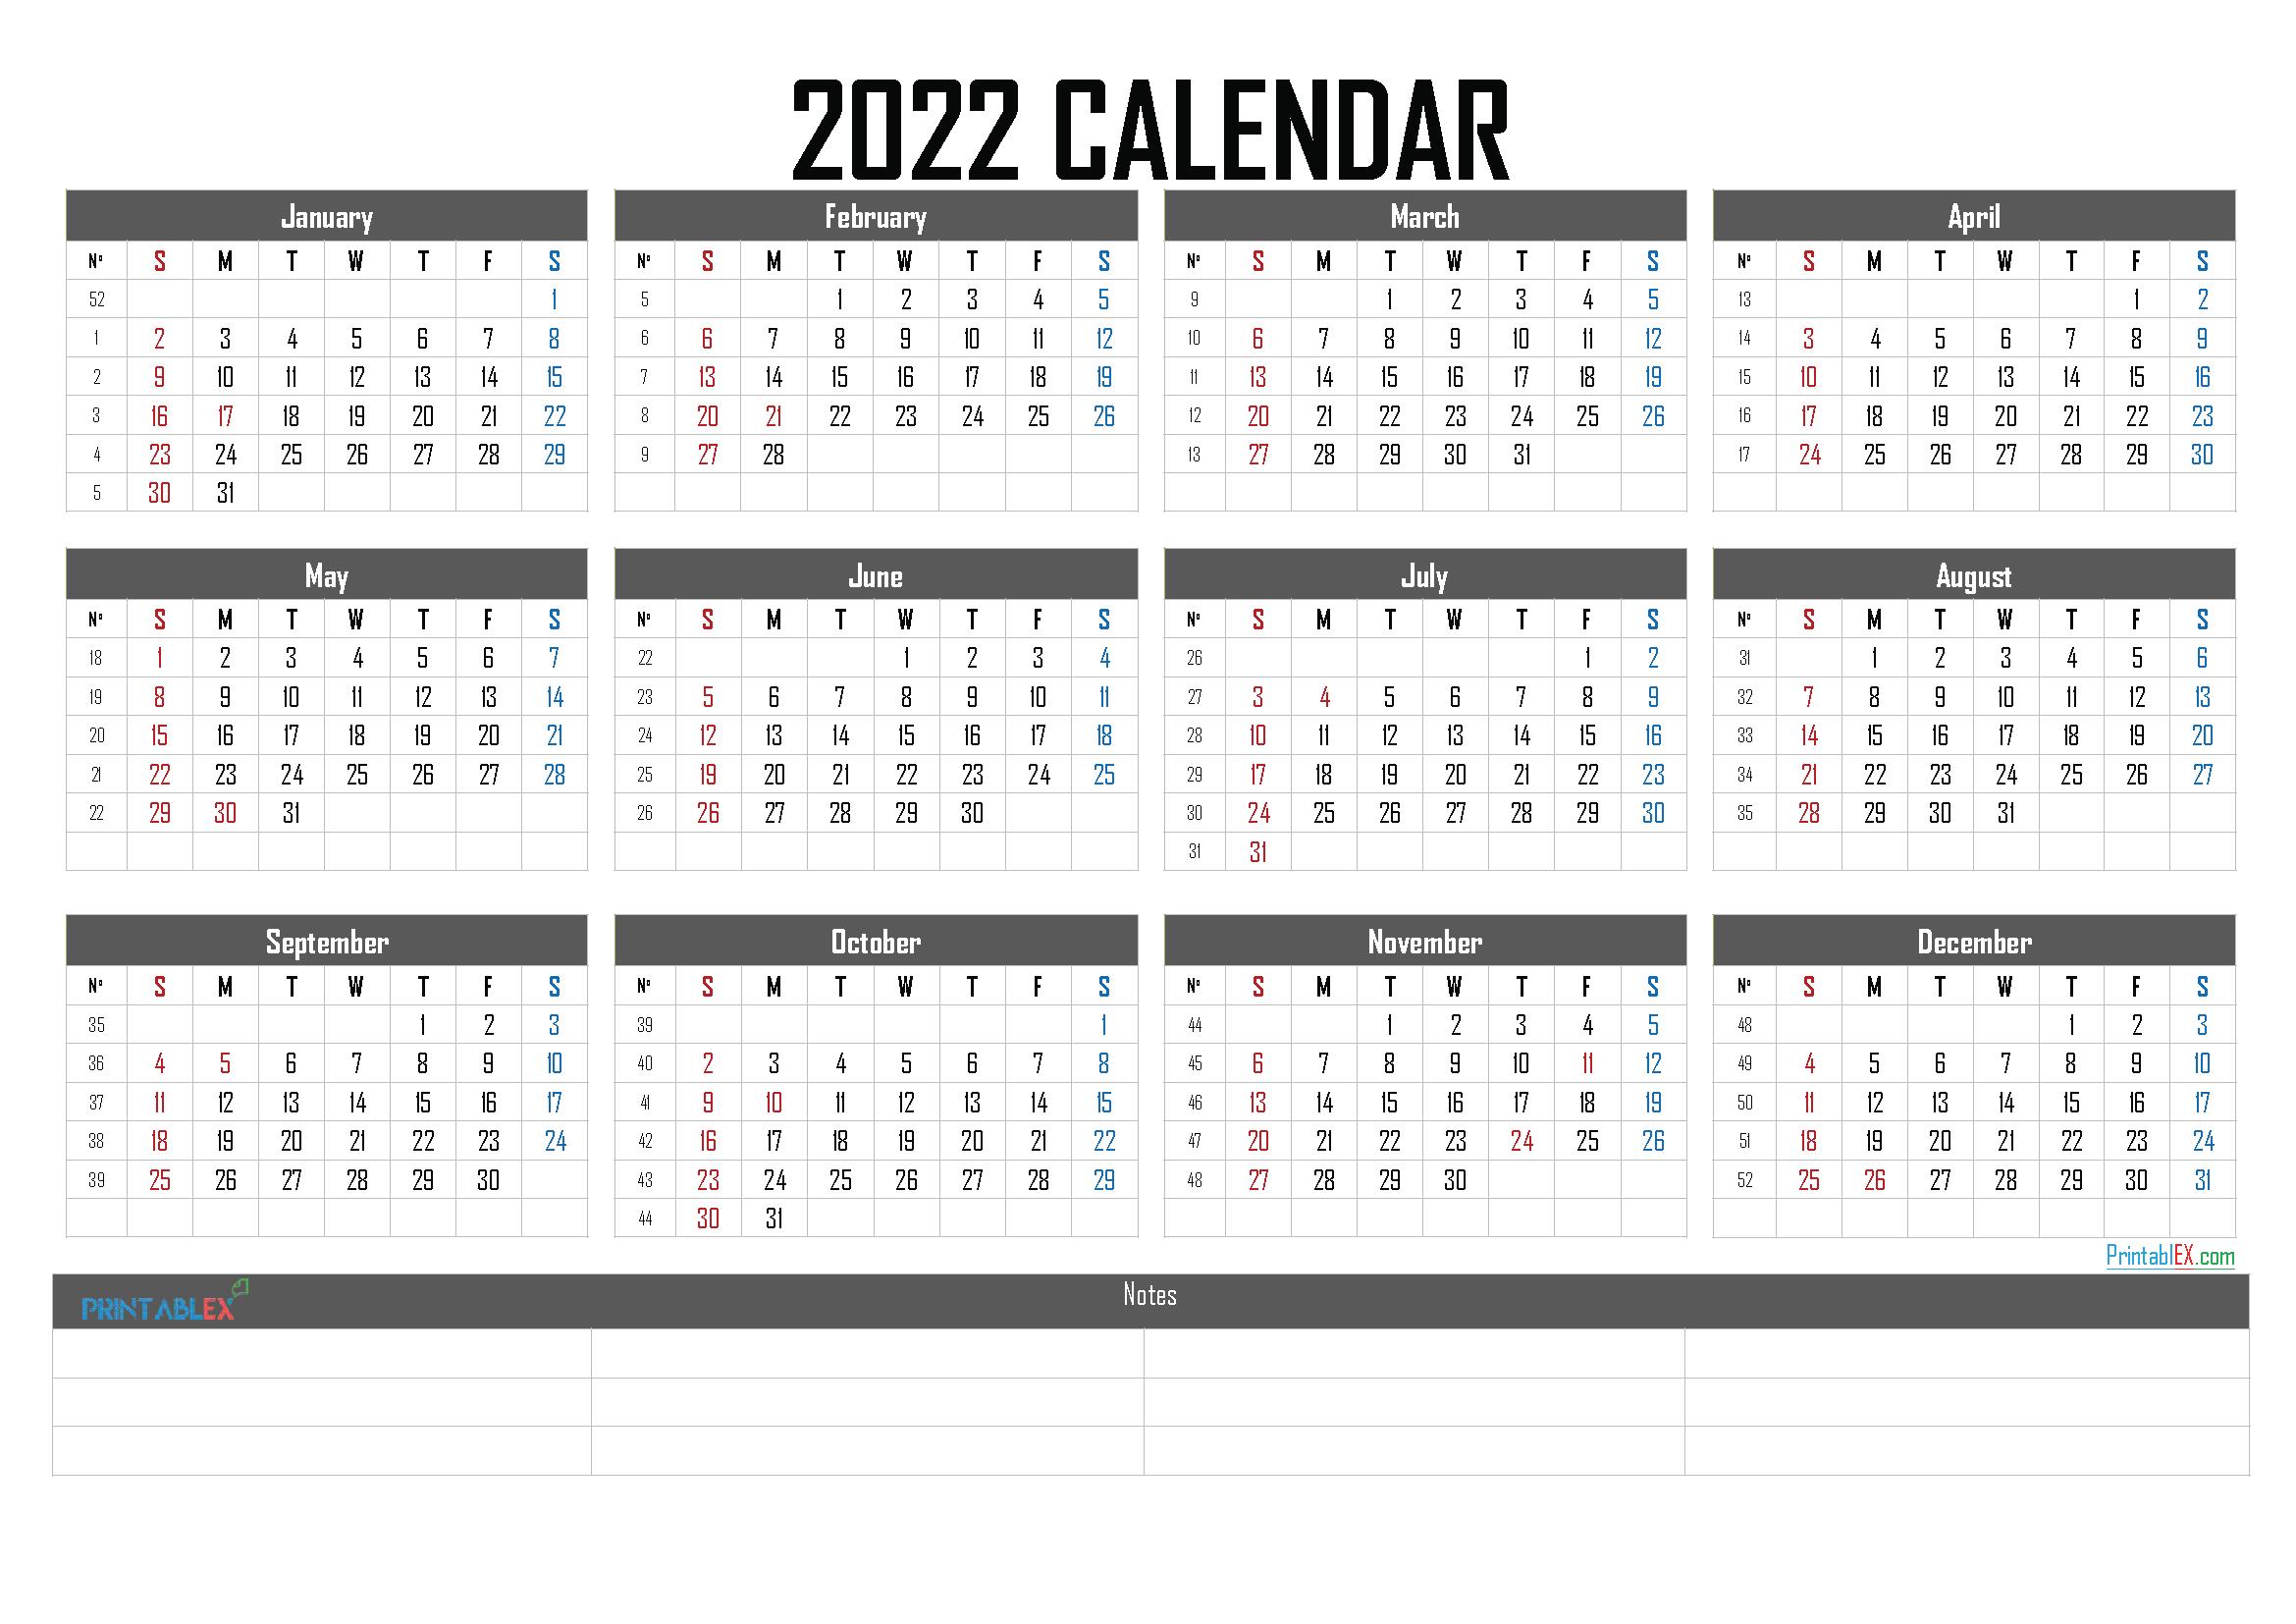 2022 Calendar With Weeks.2022 Calendar With Week Numbers Printable 22ytw19 Free Printable 2021 Monthly Calendar With Holidays